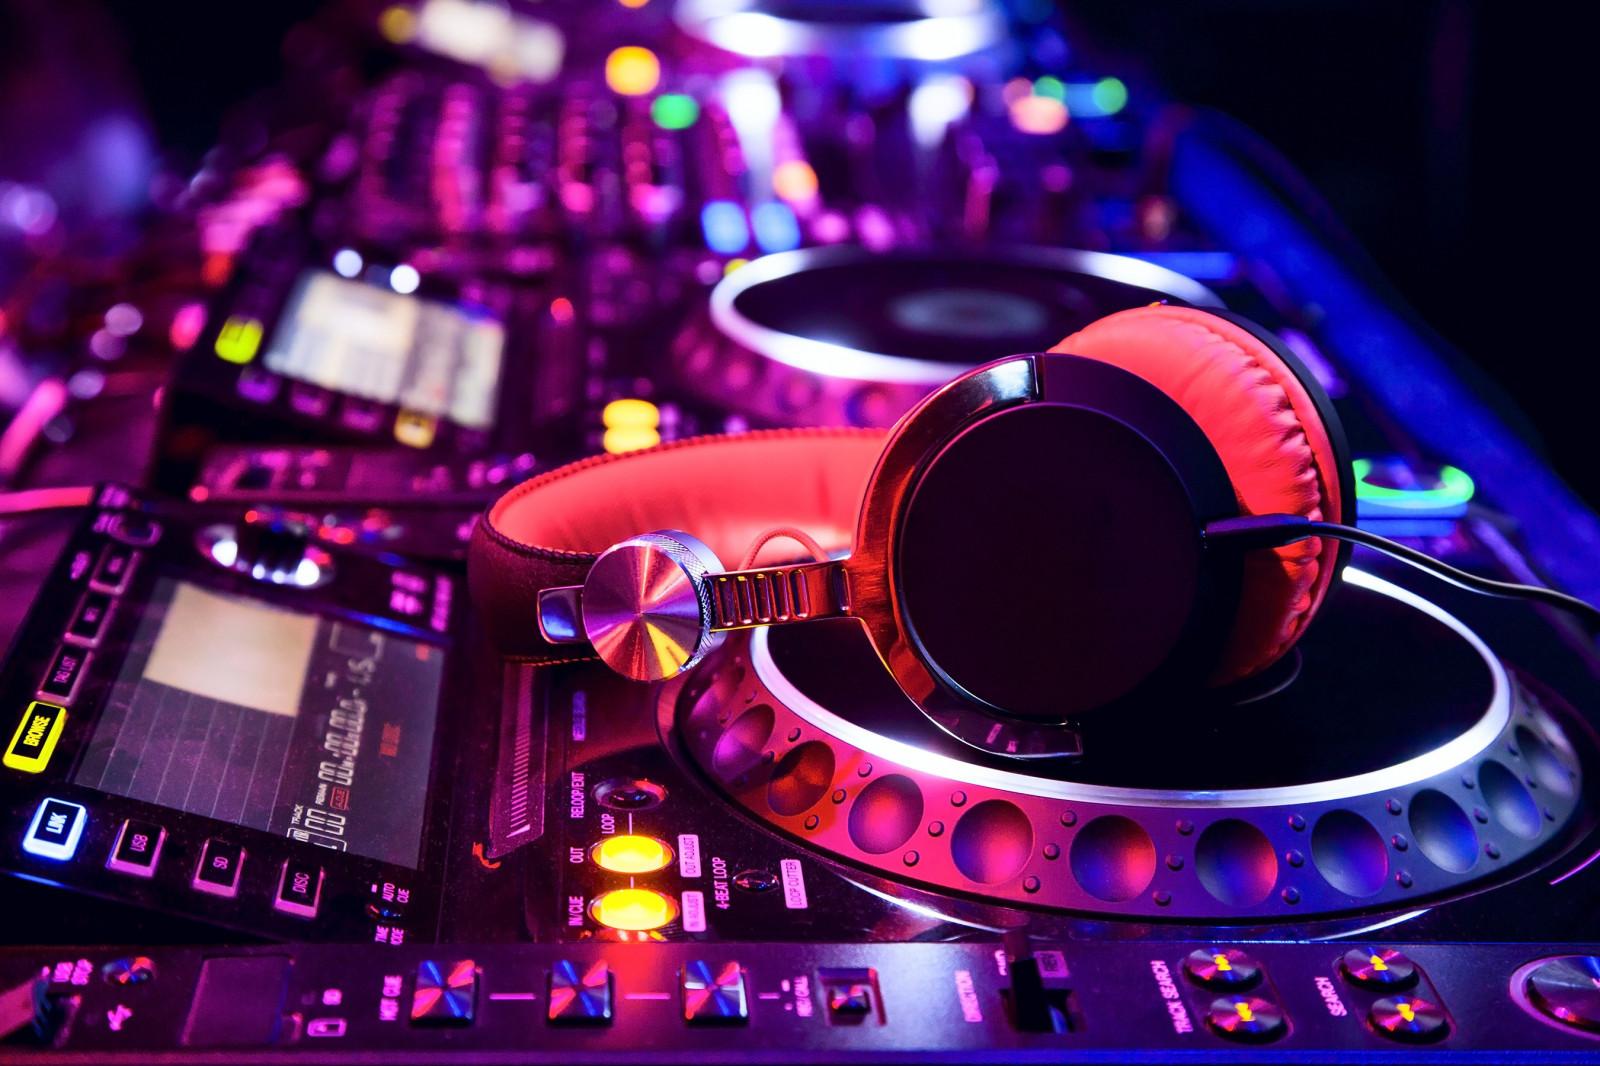 Wallpaper : lights, music, headphones, DJ, disc jockey ...